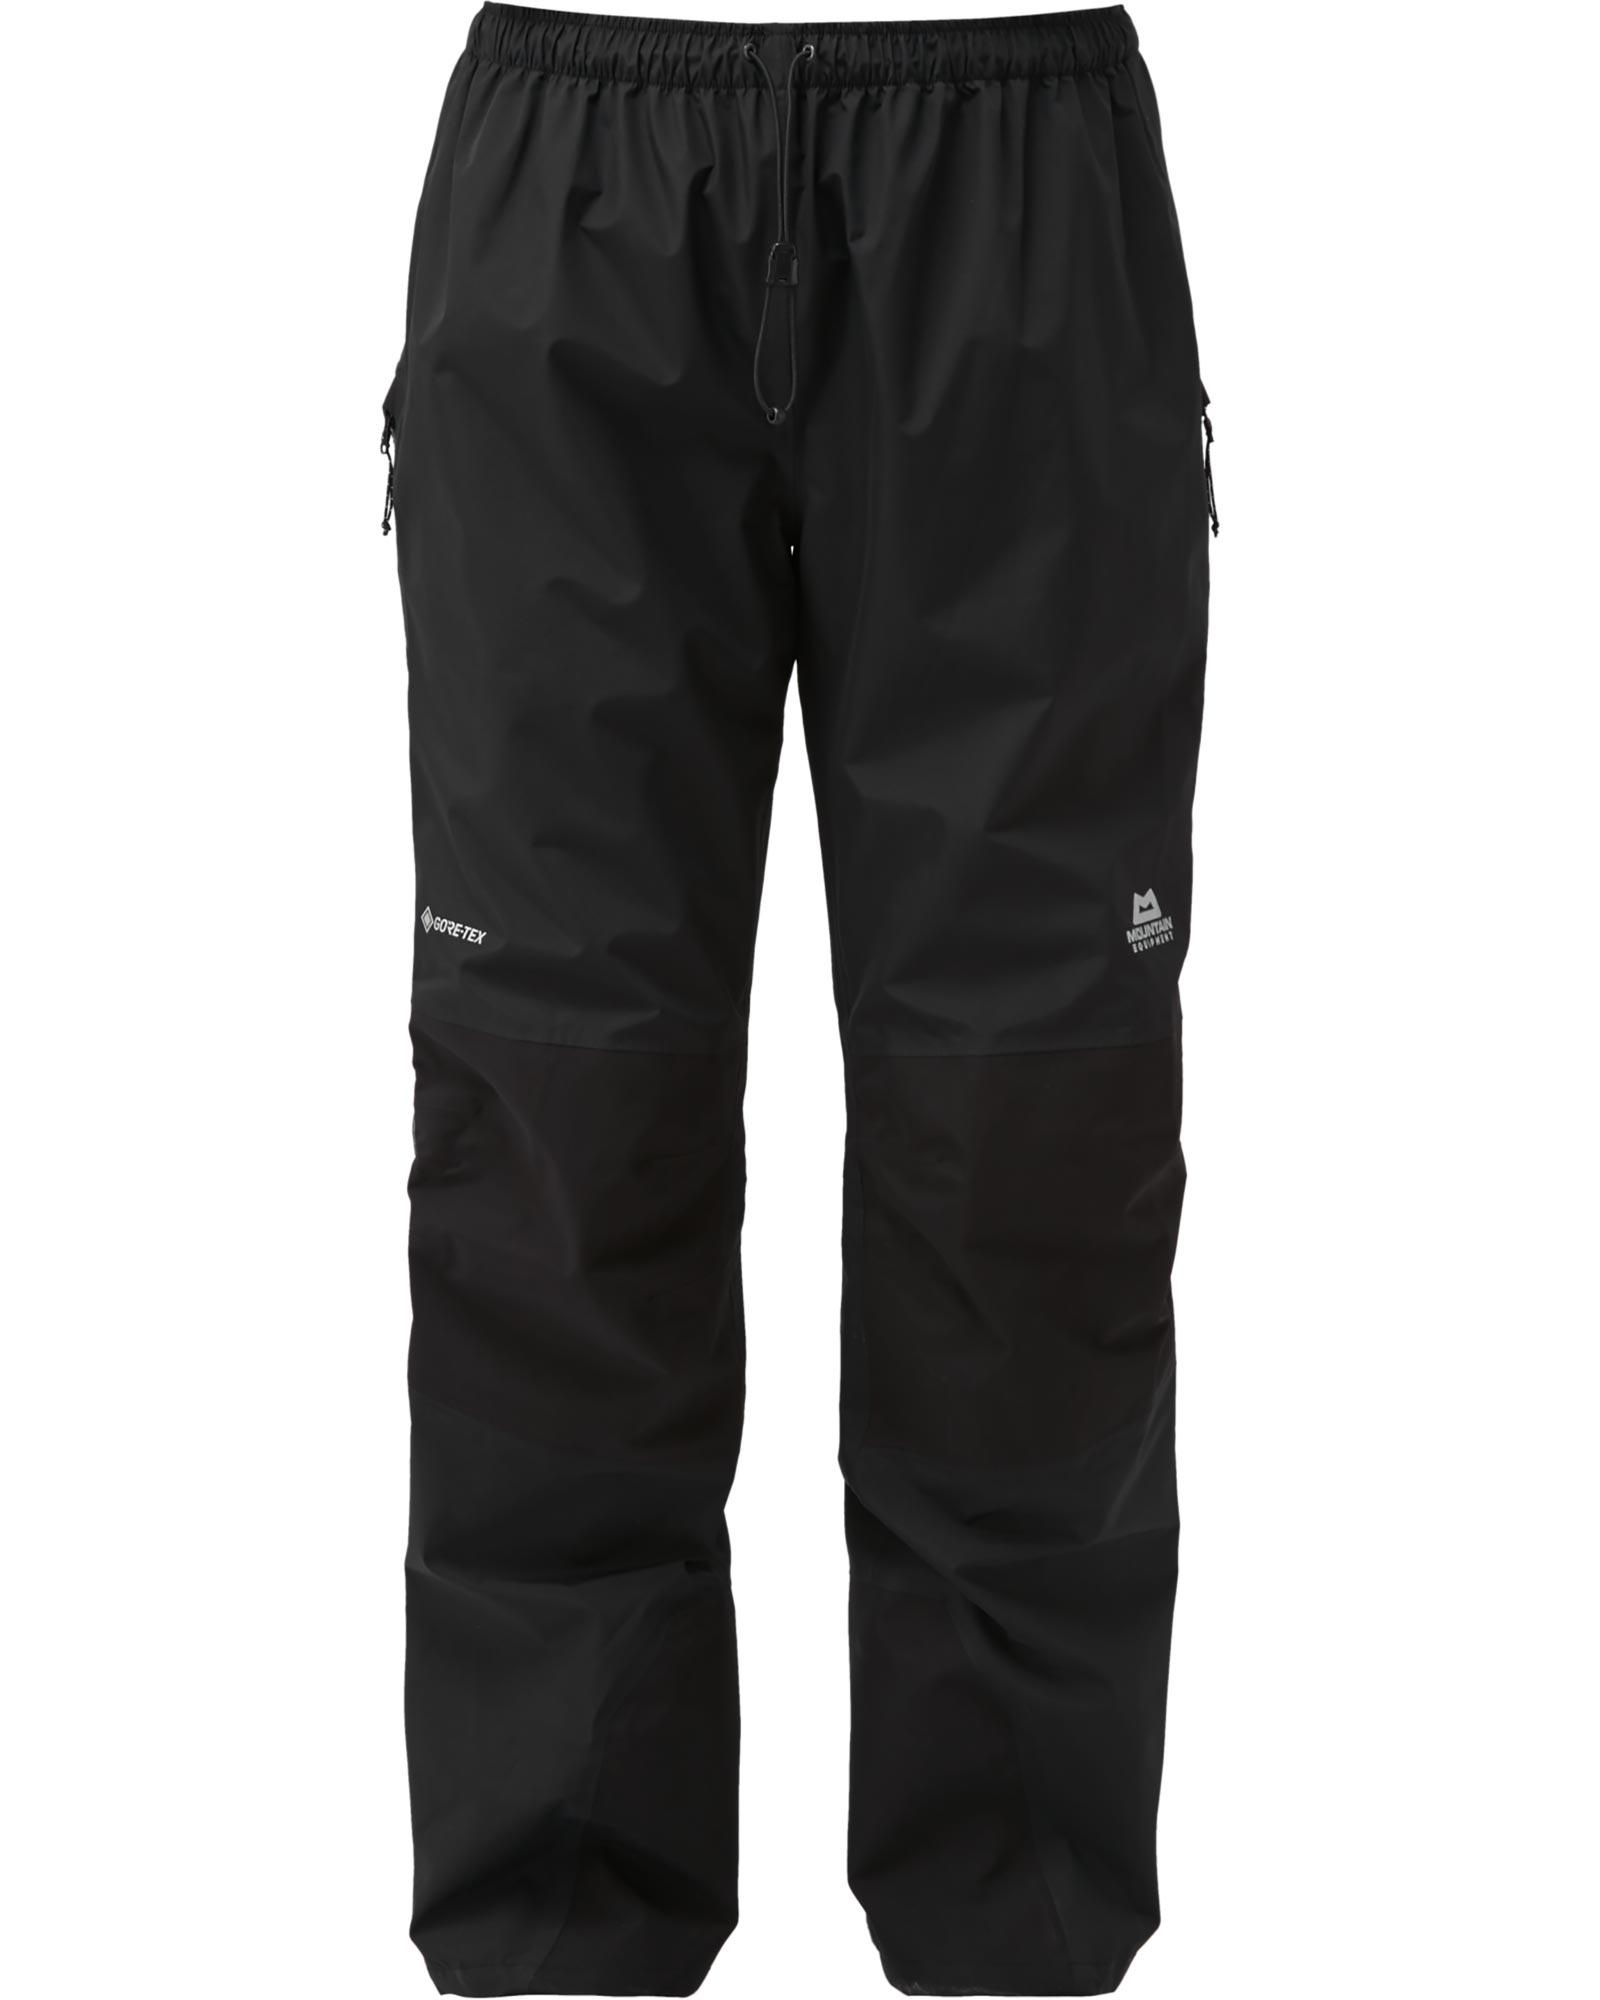 Mountain Equipment Saltoro GORE-TEX Paclite Women's Pants 0